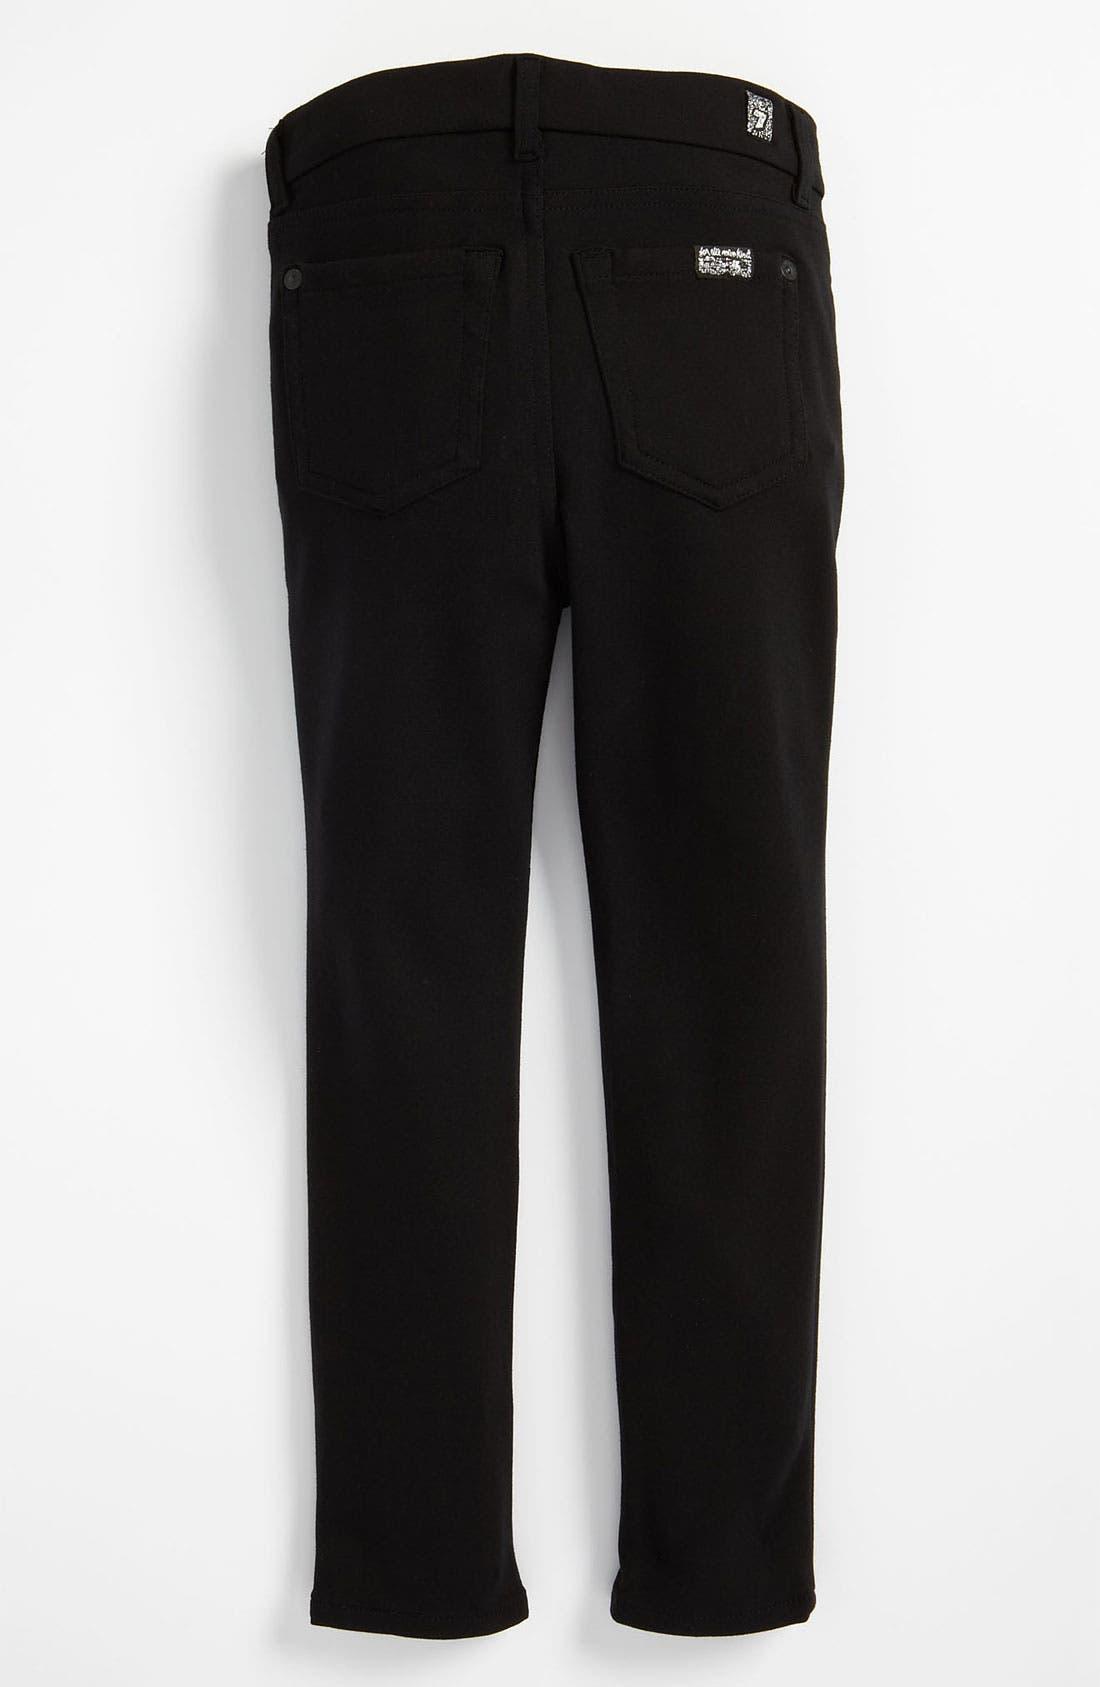 Alternate Image 1 Selected - 7 For All Mankind® Skinny Ponte Knit Pants (Little Girls)